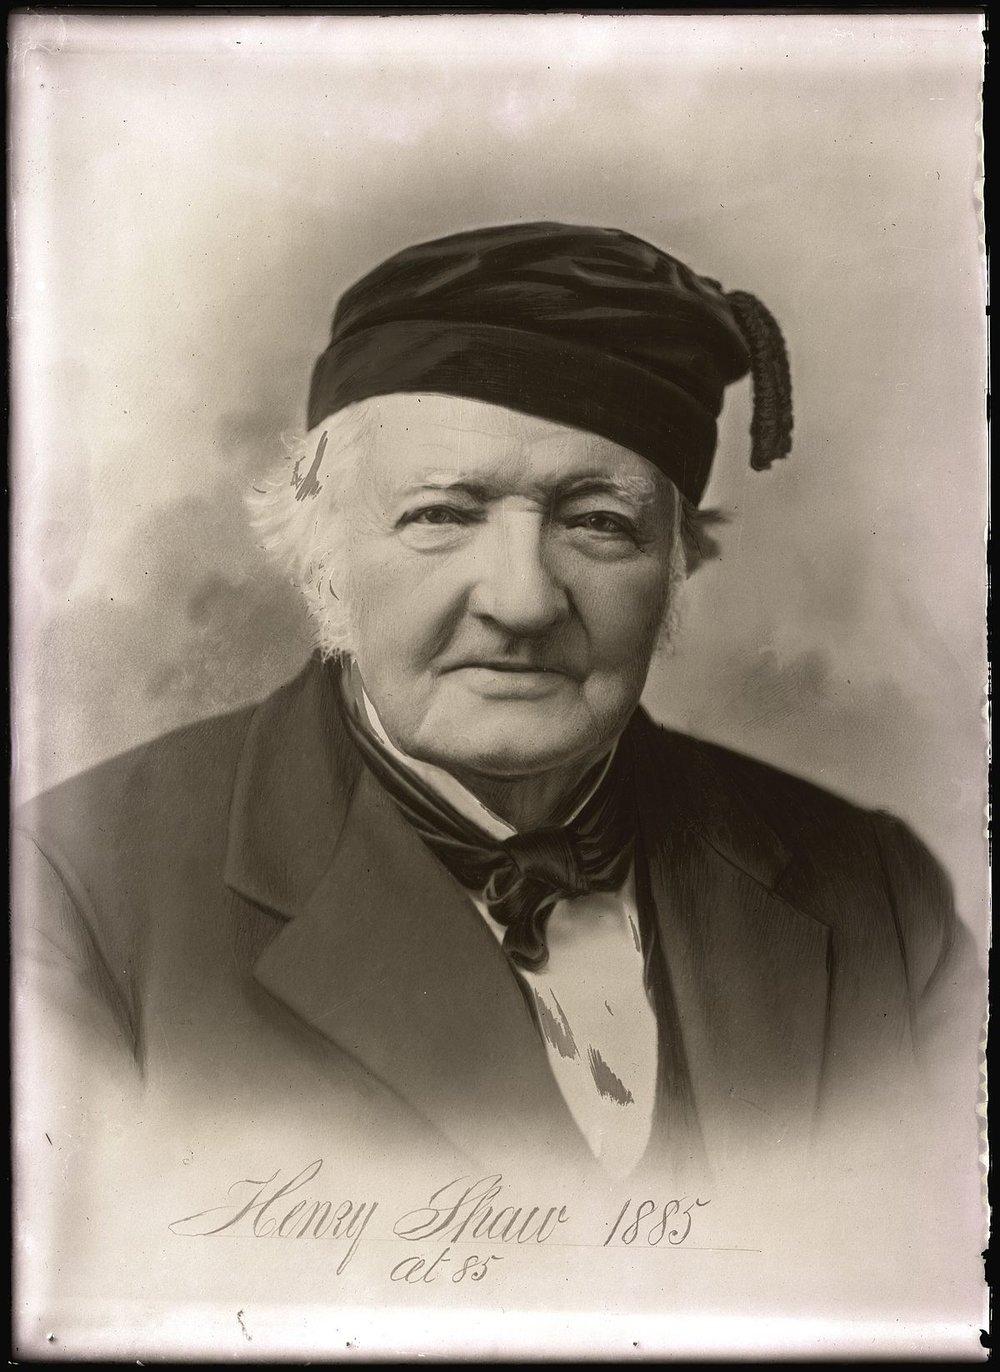 1200px-1909_-_Henry_Shaw_-_portrait_in_nightcap_-_MoBOT_GPN_1982-0180.jpg